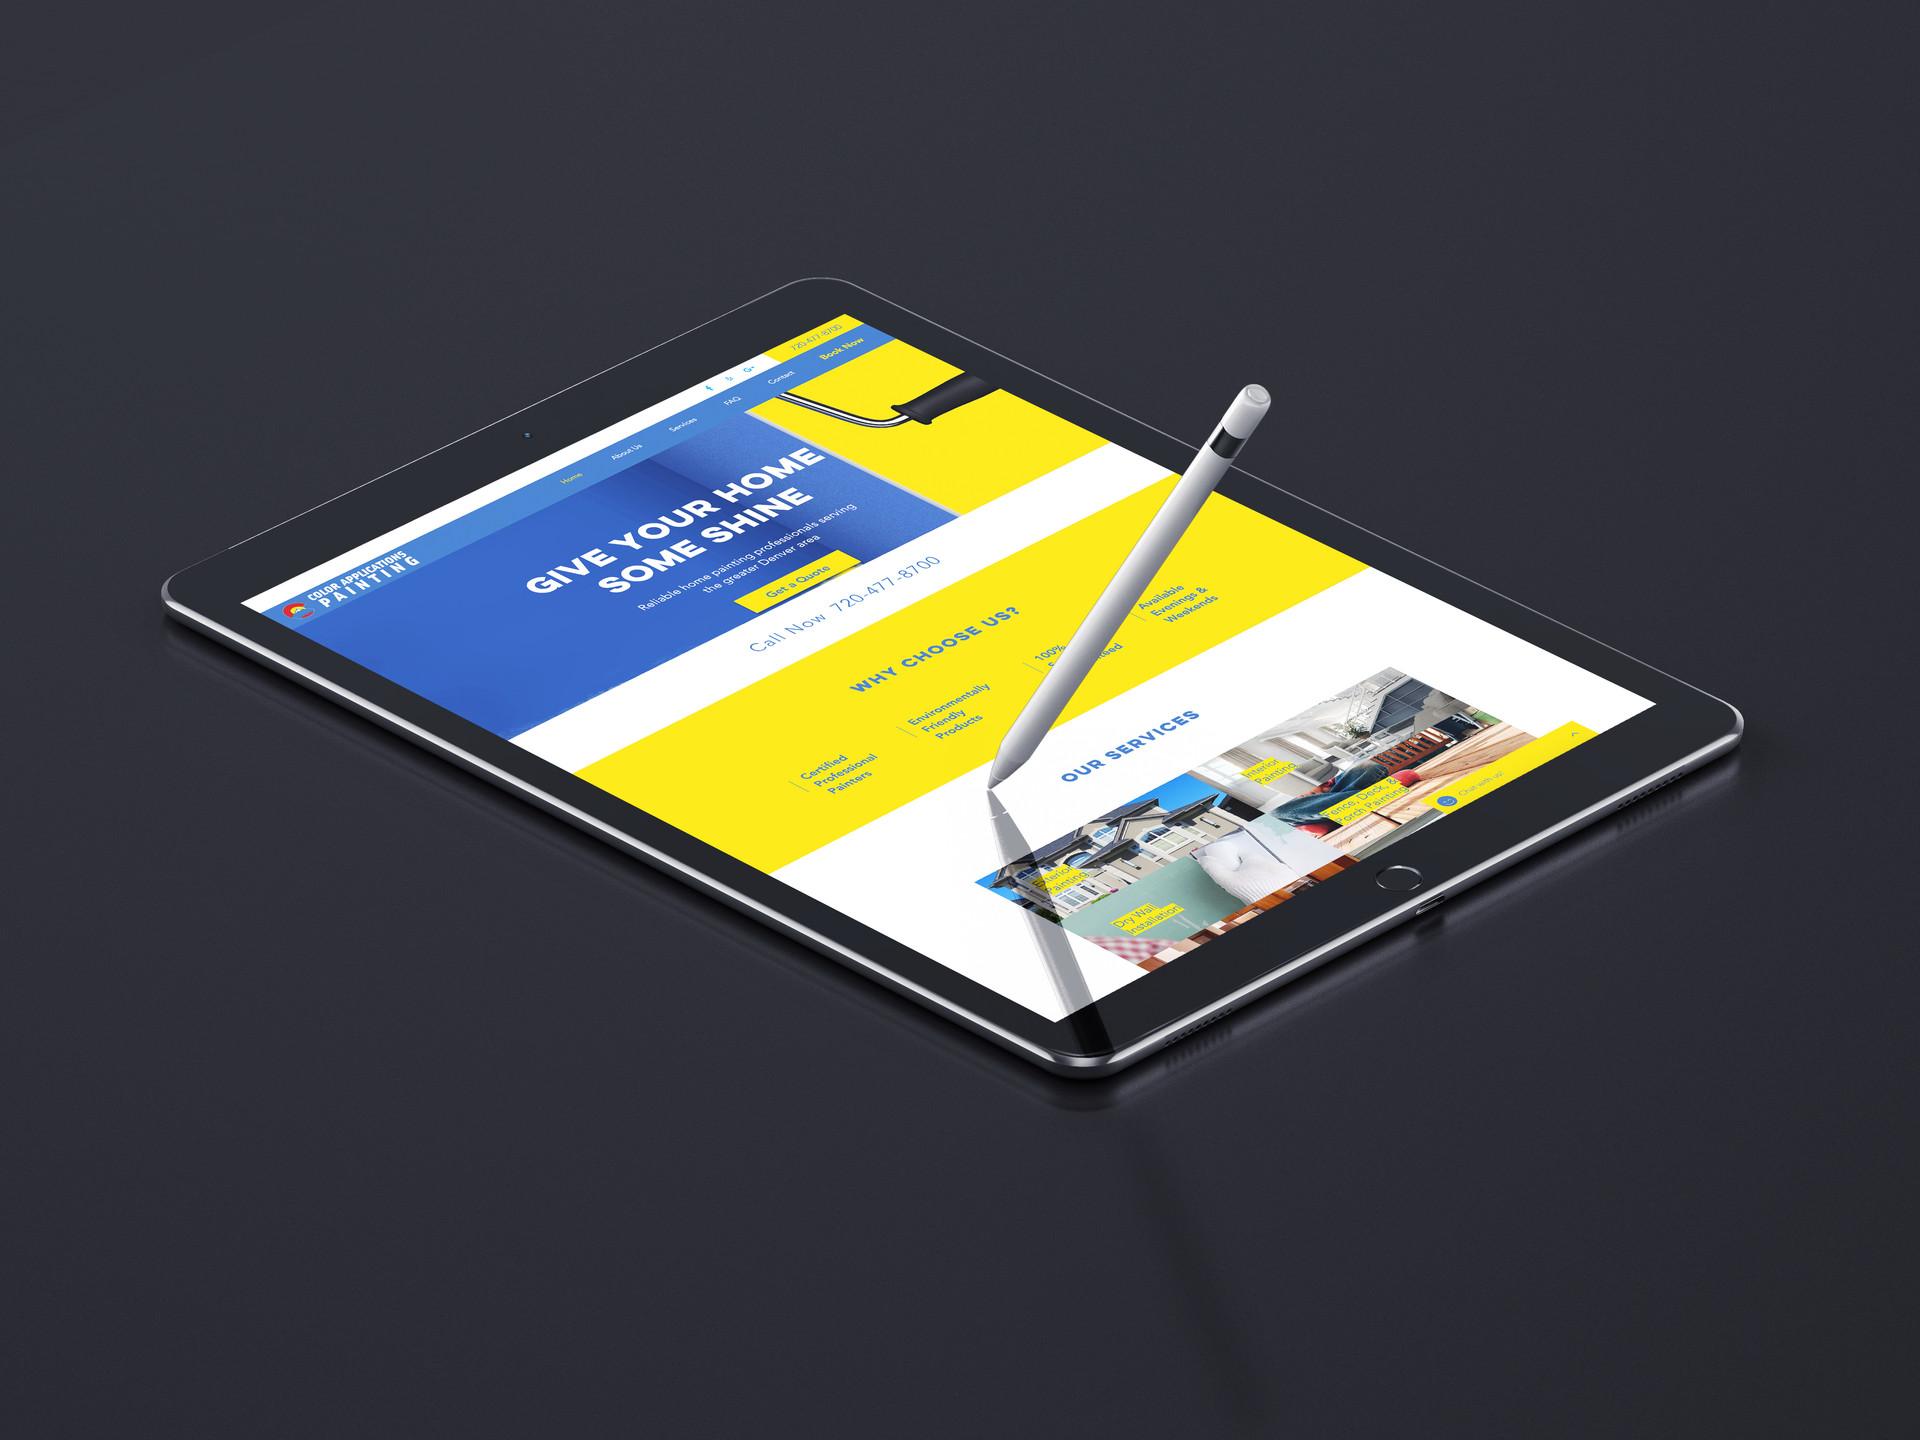 Web design mobile optimized